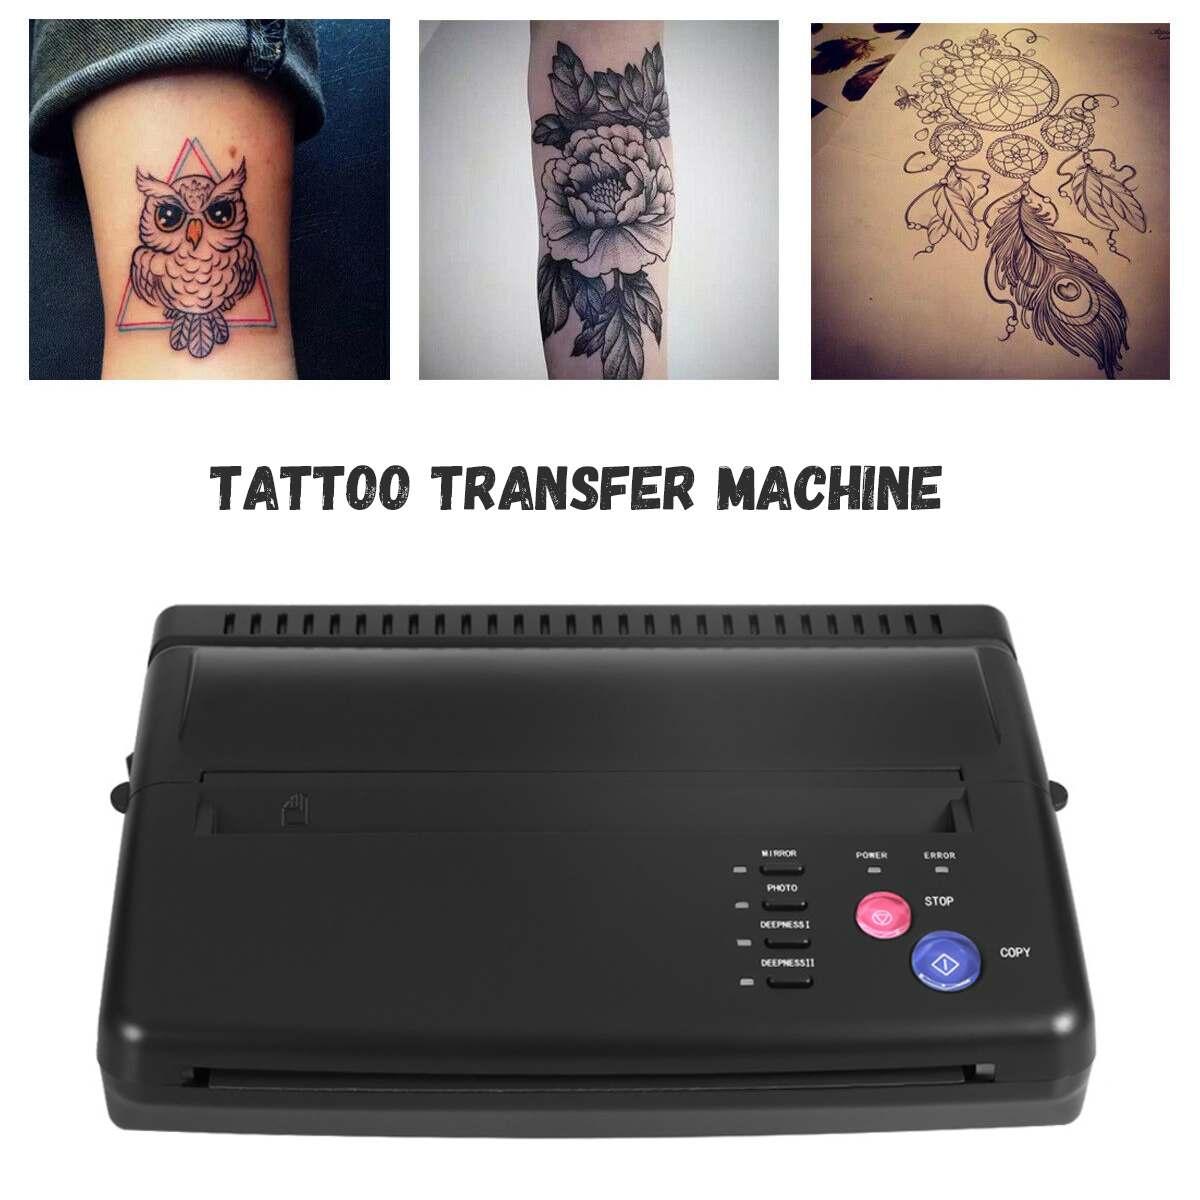 High Speed Tattoo Transfer Copy Machine Printer Drawing Thermal Maker Copier for Tattoo Transfer Paper Supply EU/US Plug Artist